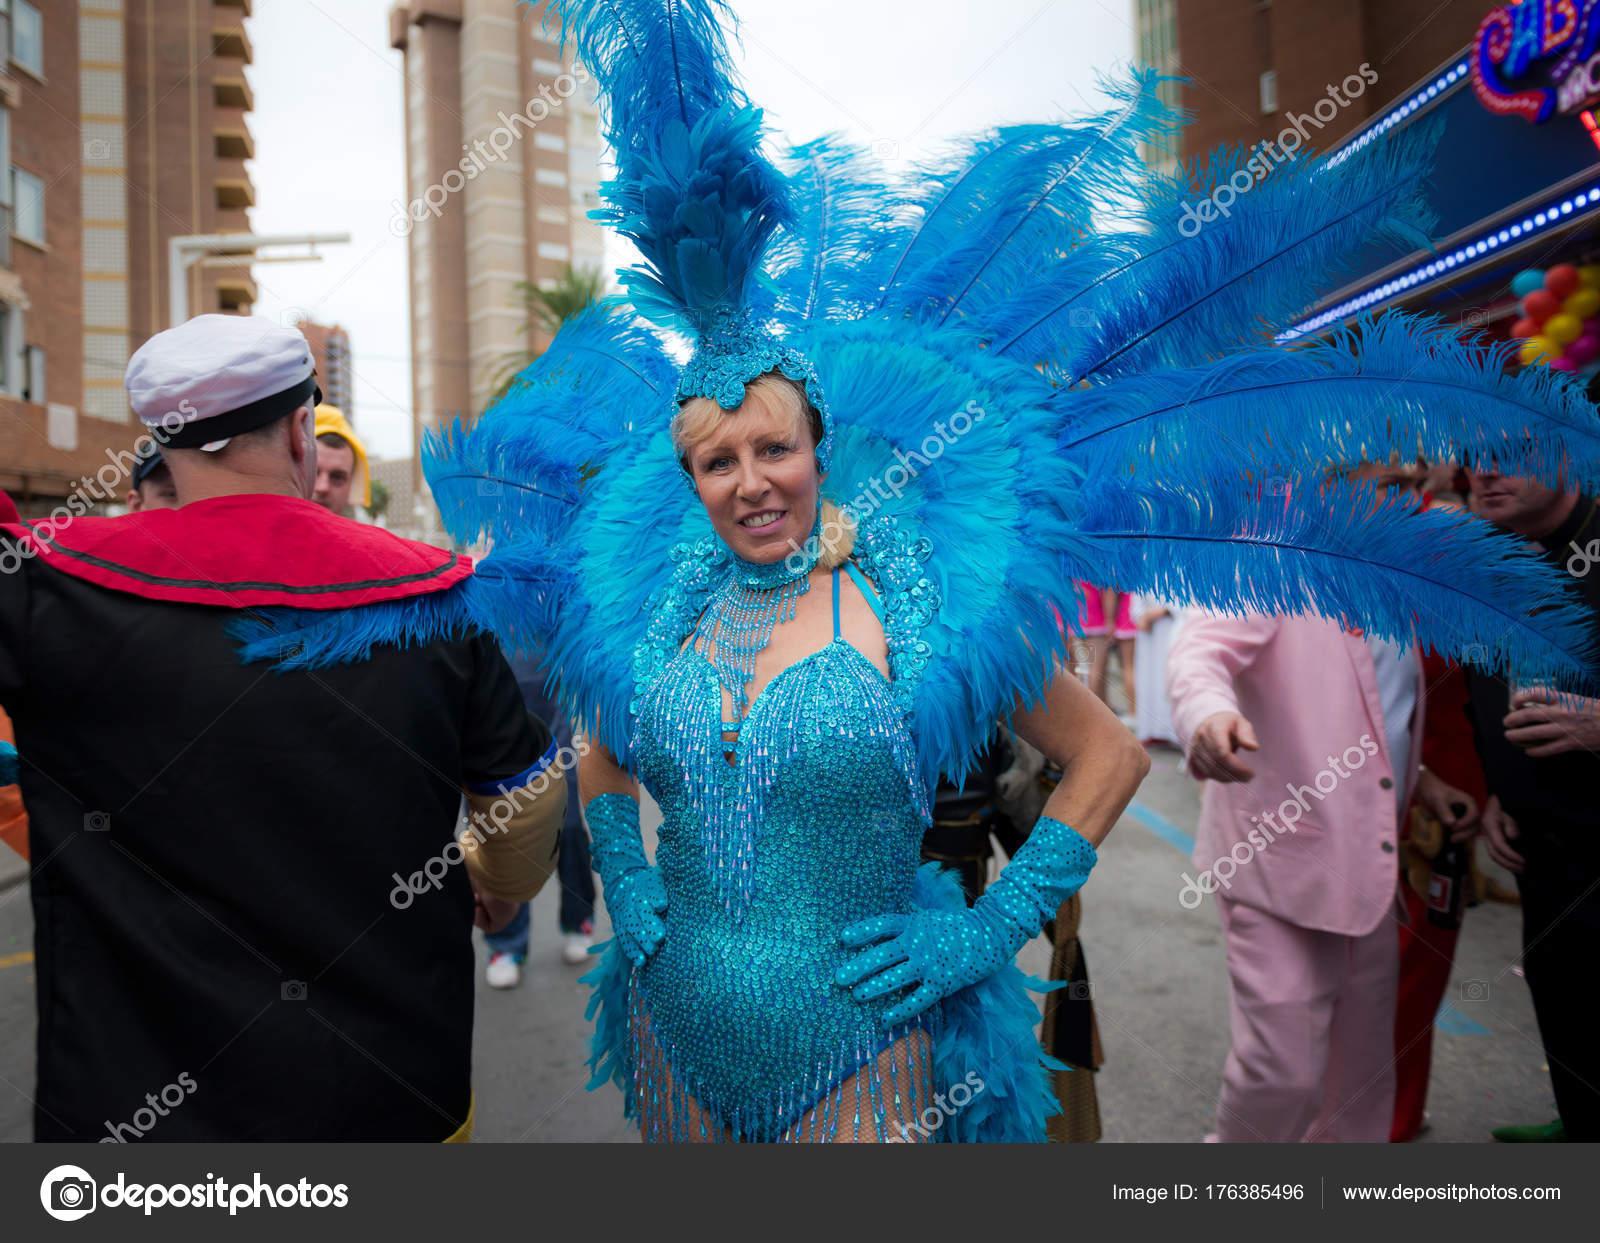 Benidorm English Fancy Dress Party November 2015 Benidorm Region ...